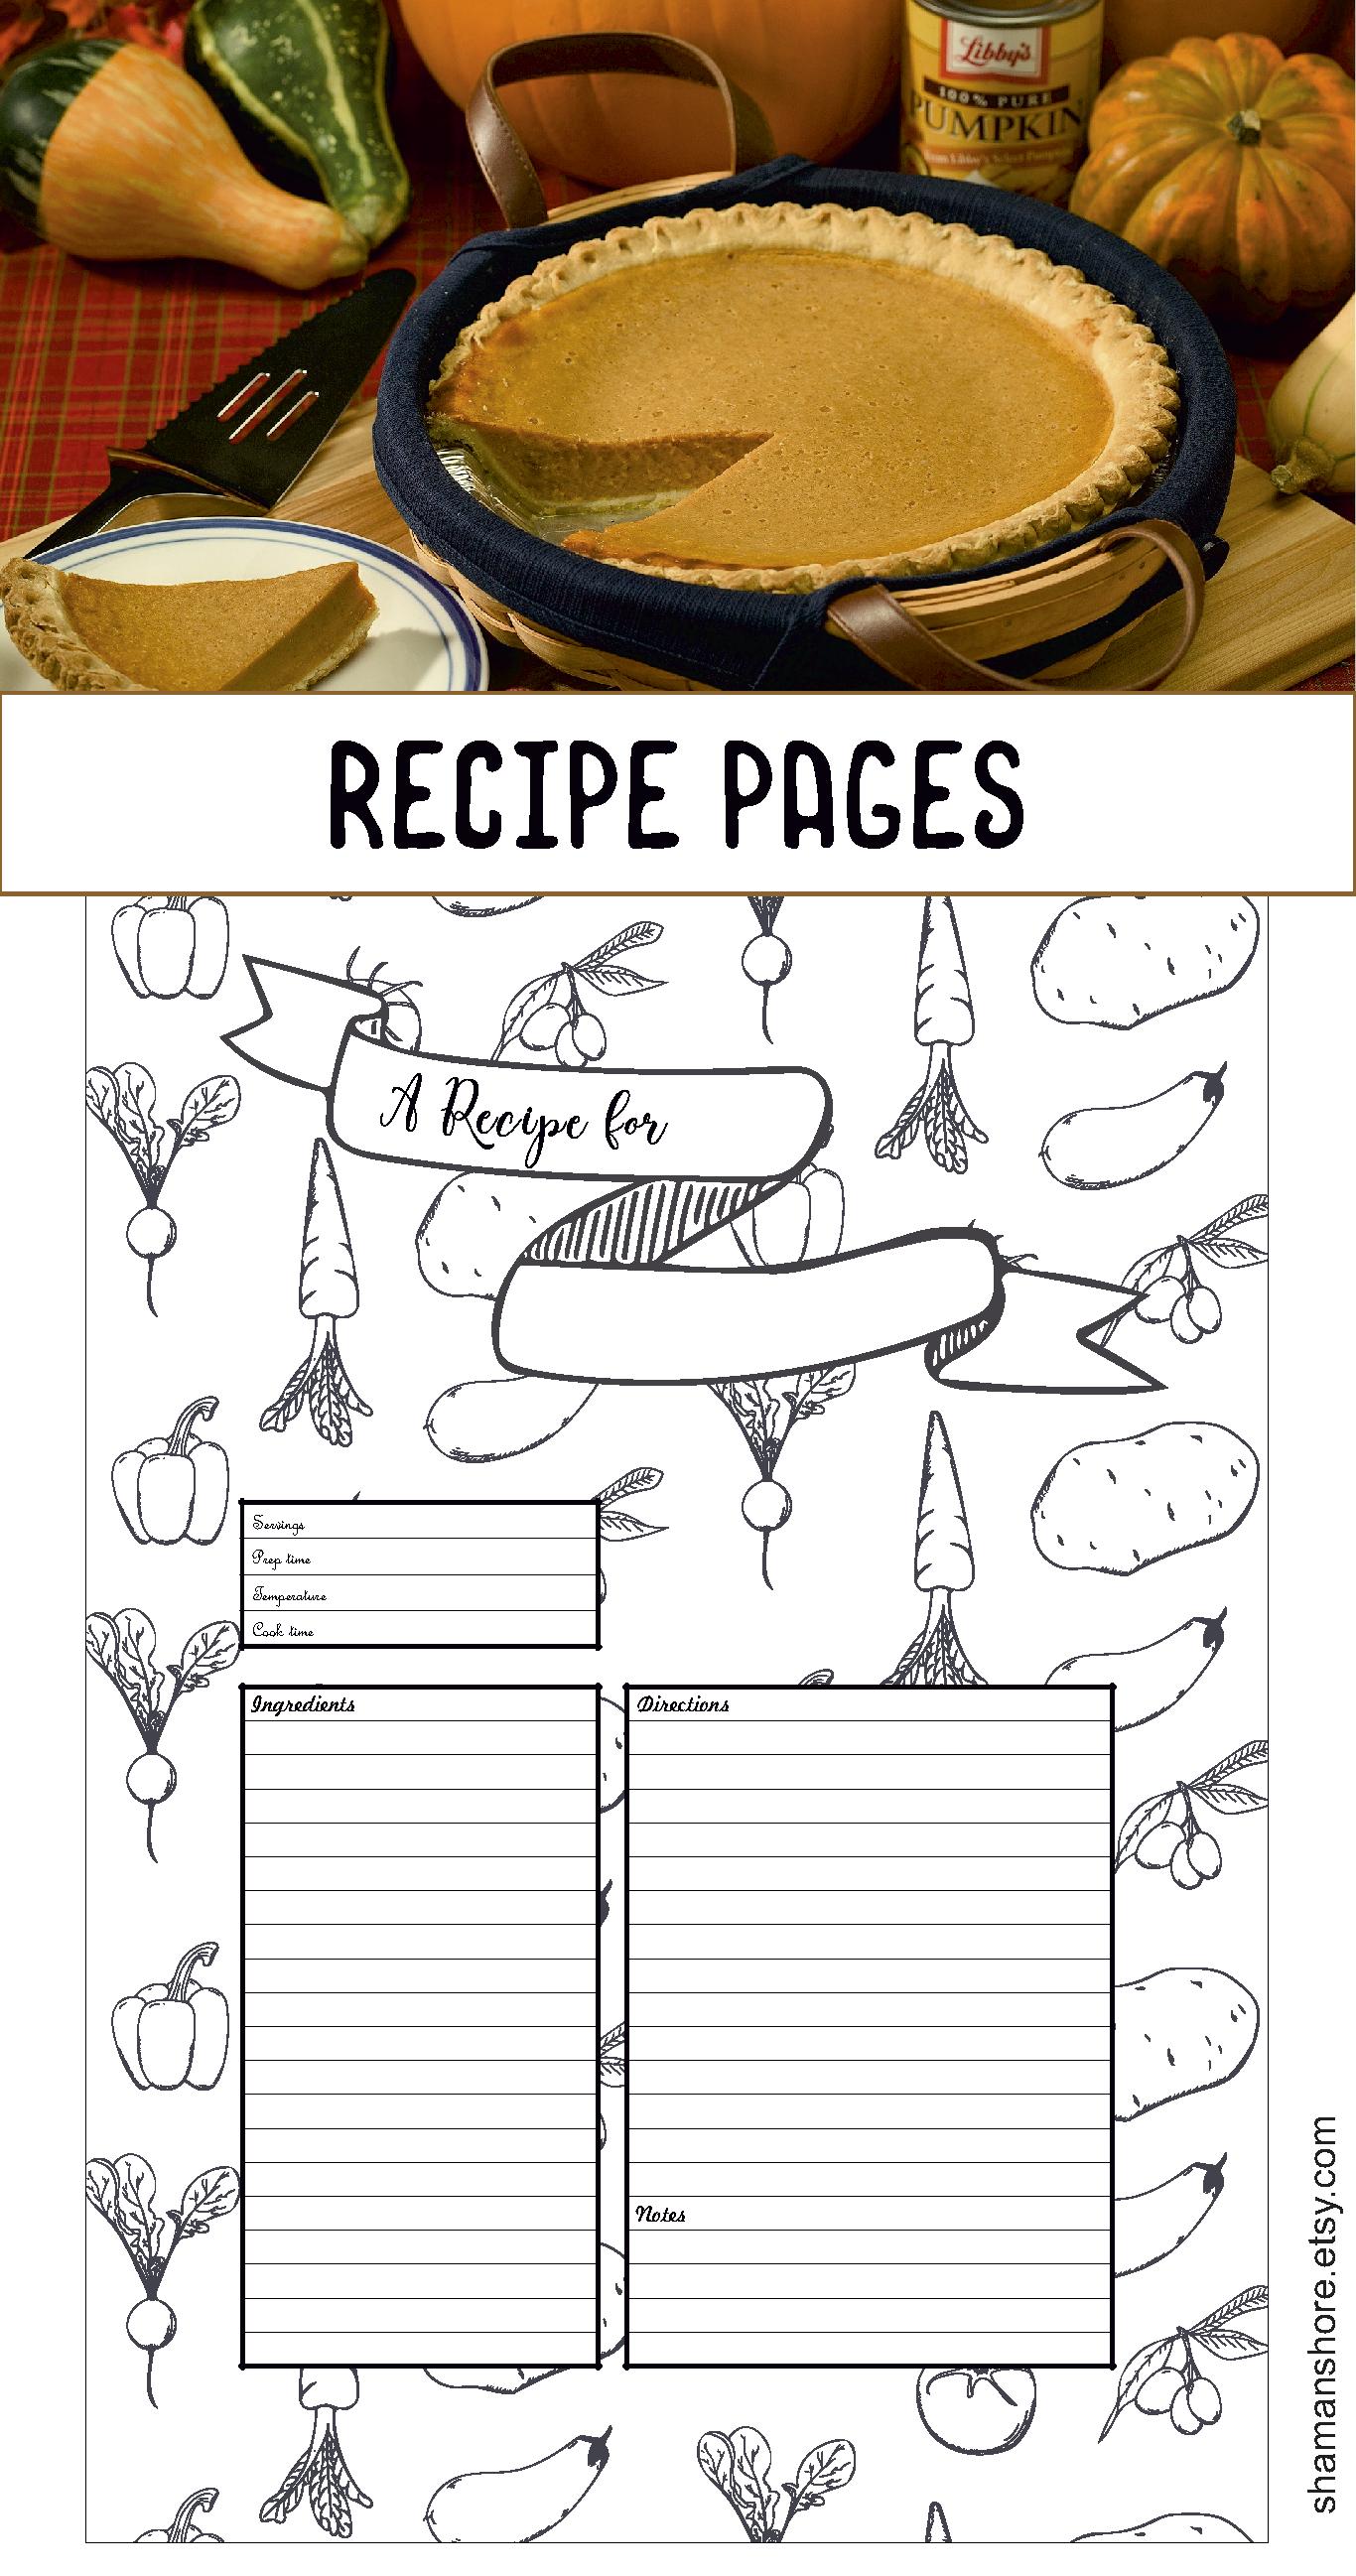 Recipe Template Printable Recipe Pages Layouts Blank Recipe Book Pdf Recipe Cards A4 Recipe Sheets Instant Download Recipe Template Printable Printable Recipe Page Scrapbook Recipe Book